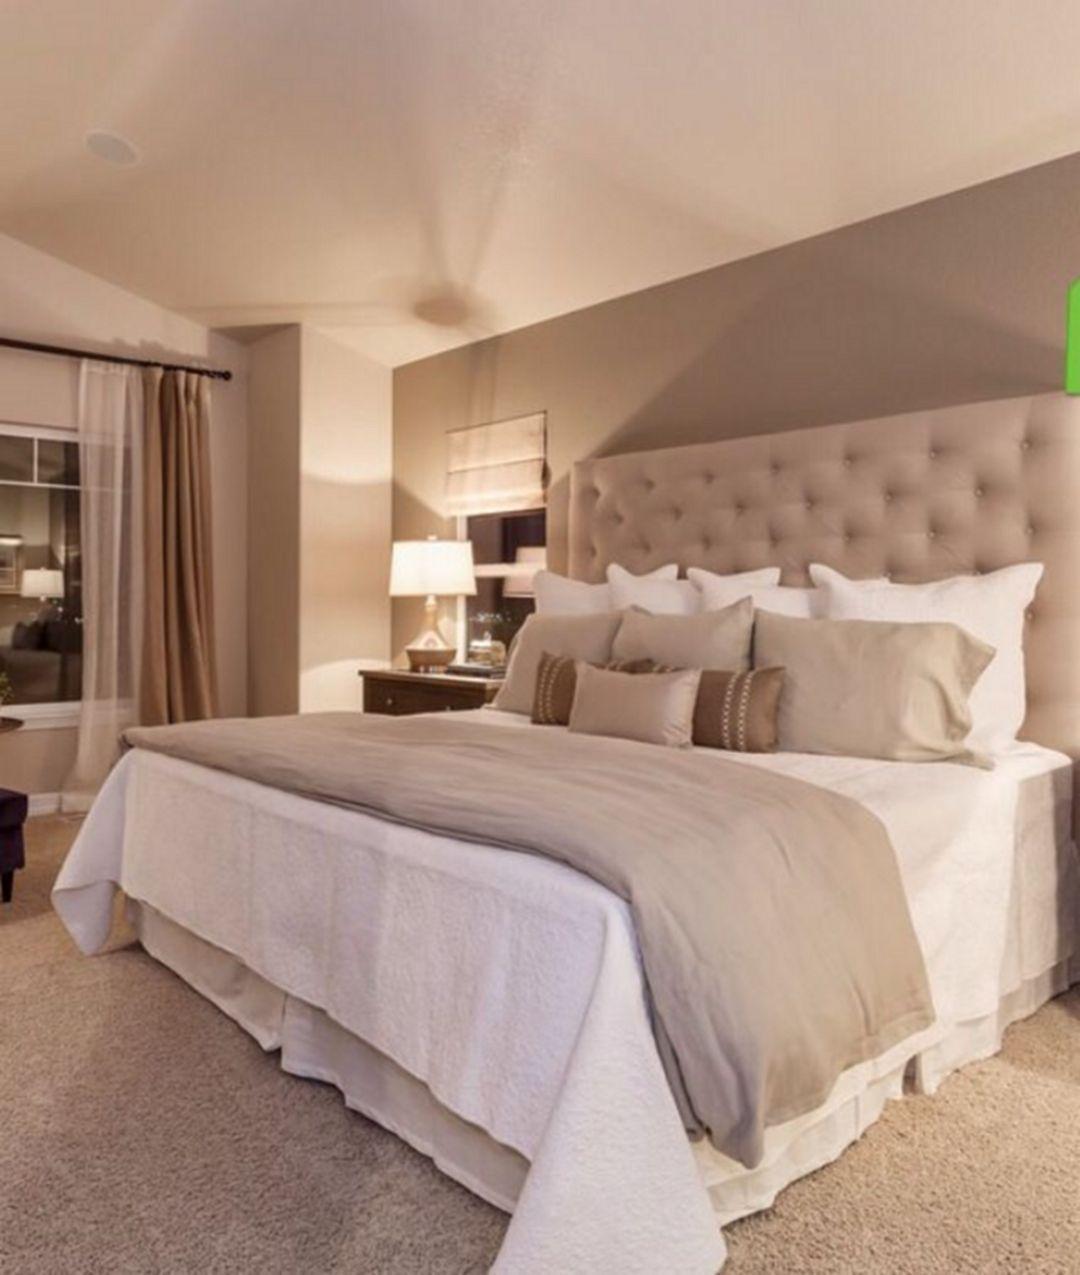 Romantic Master Bedroom Designs The Best 150 Amazing Romantic Master Bedroom Design Ideas You Have